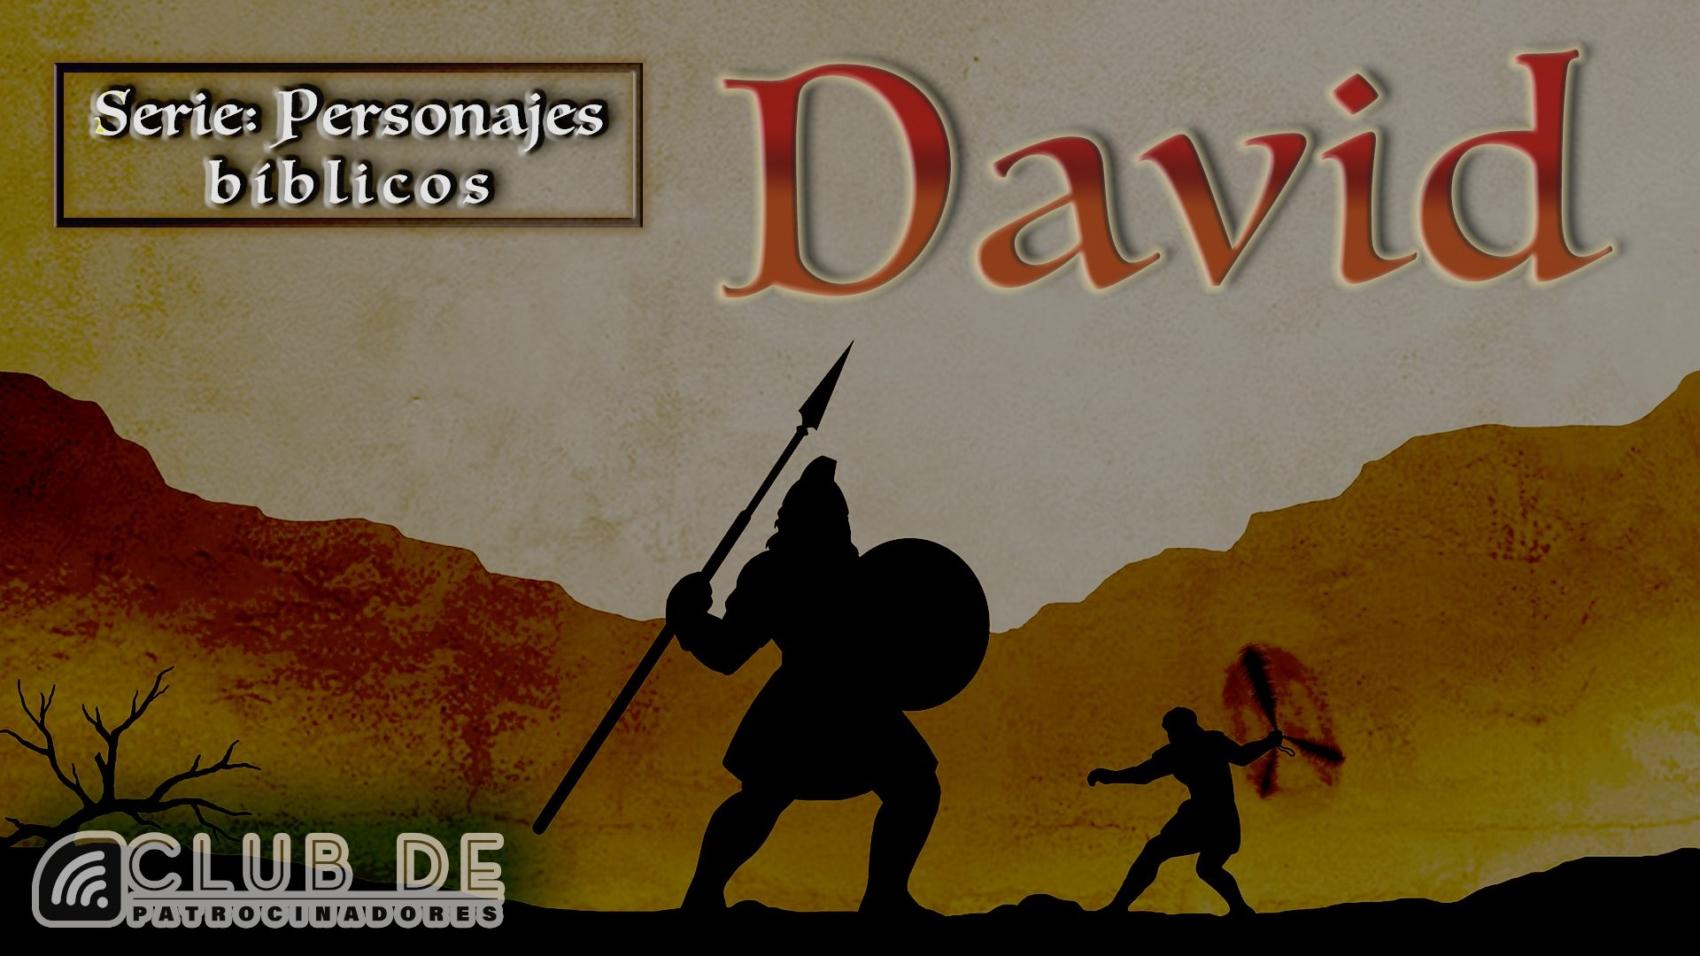 CP_58 -personaje biblico-David 1920x1080